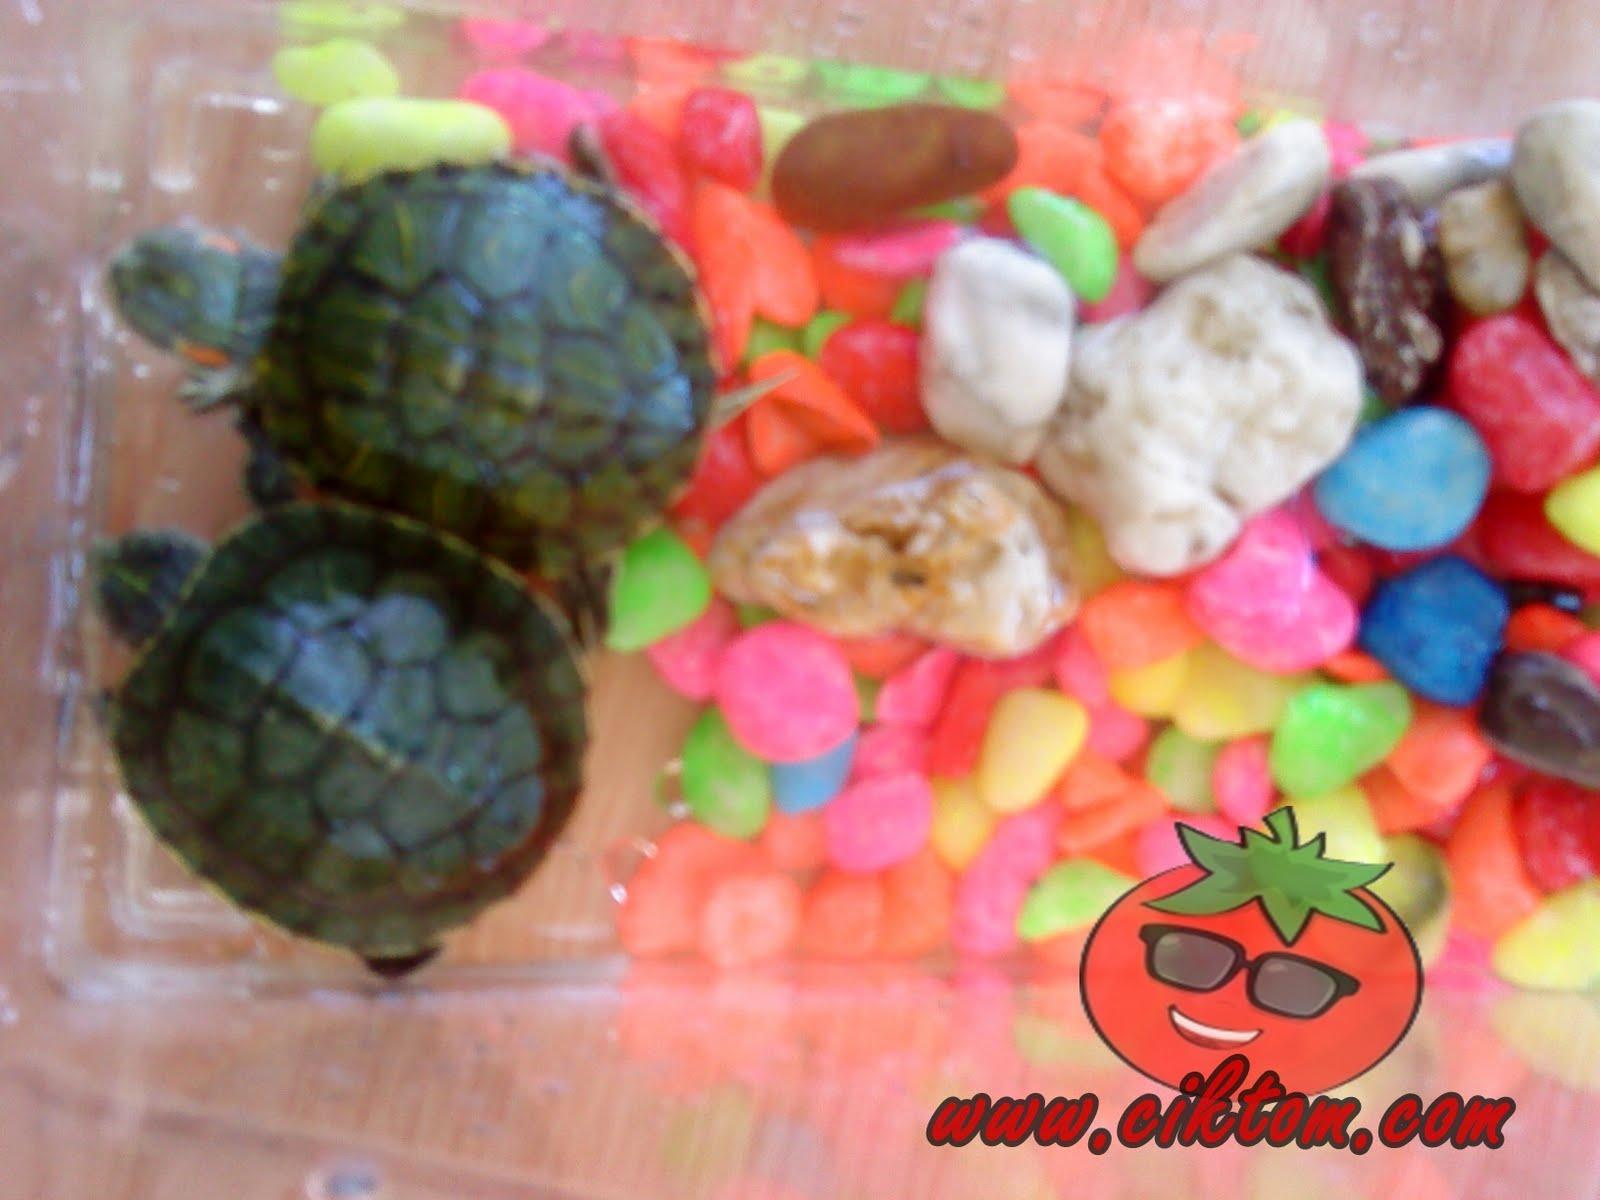 kura-kura comel